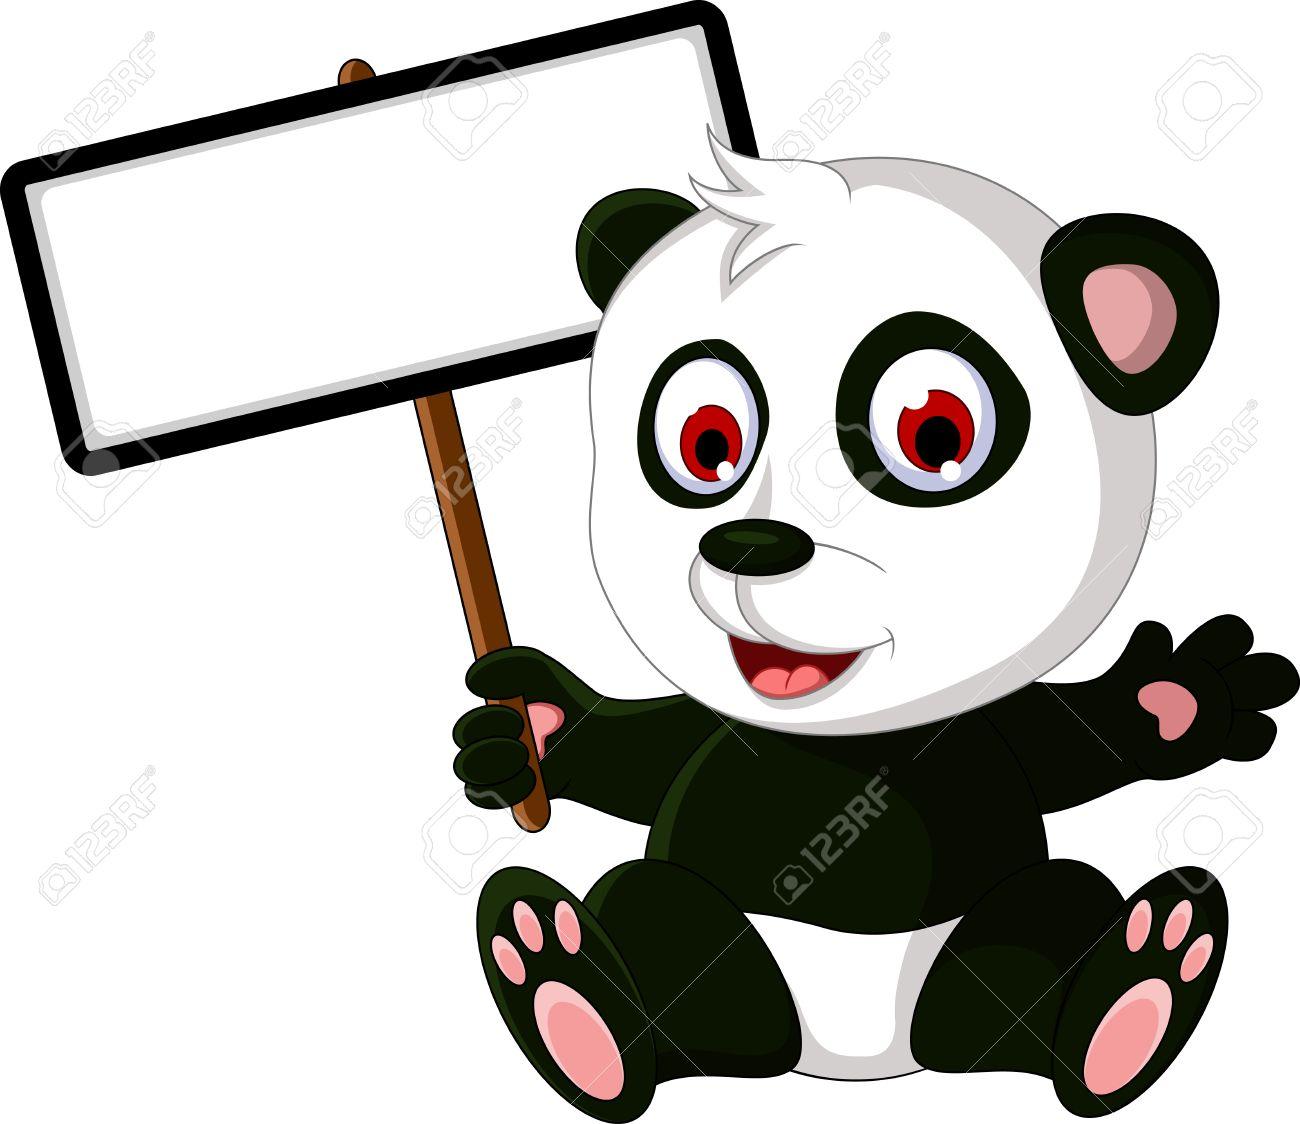 1300x1124 Cute Cartoon Panda Posing With White Board Royalty Free Cliparts